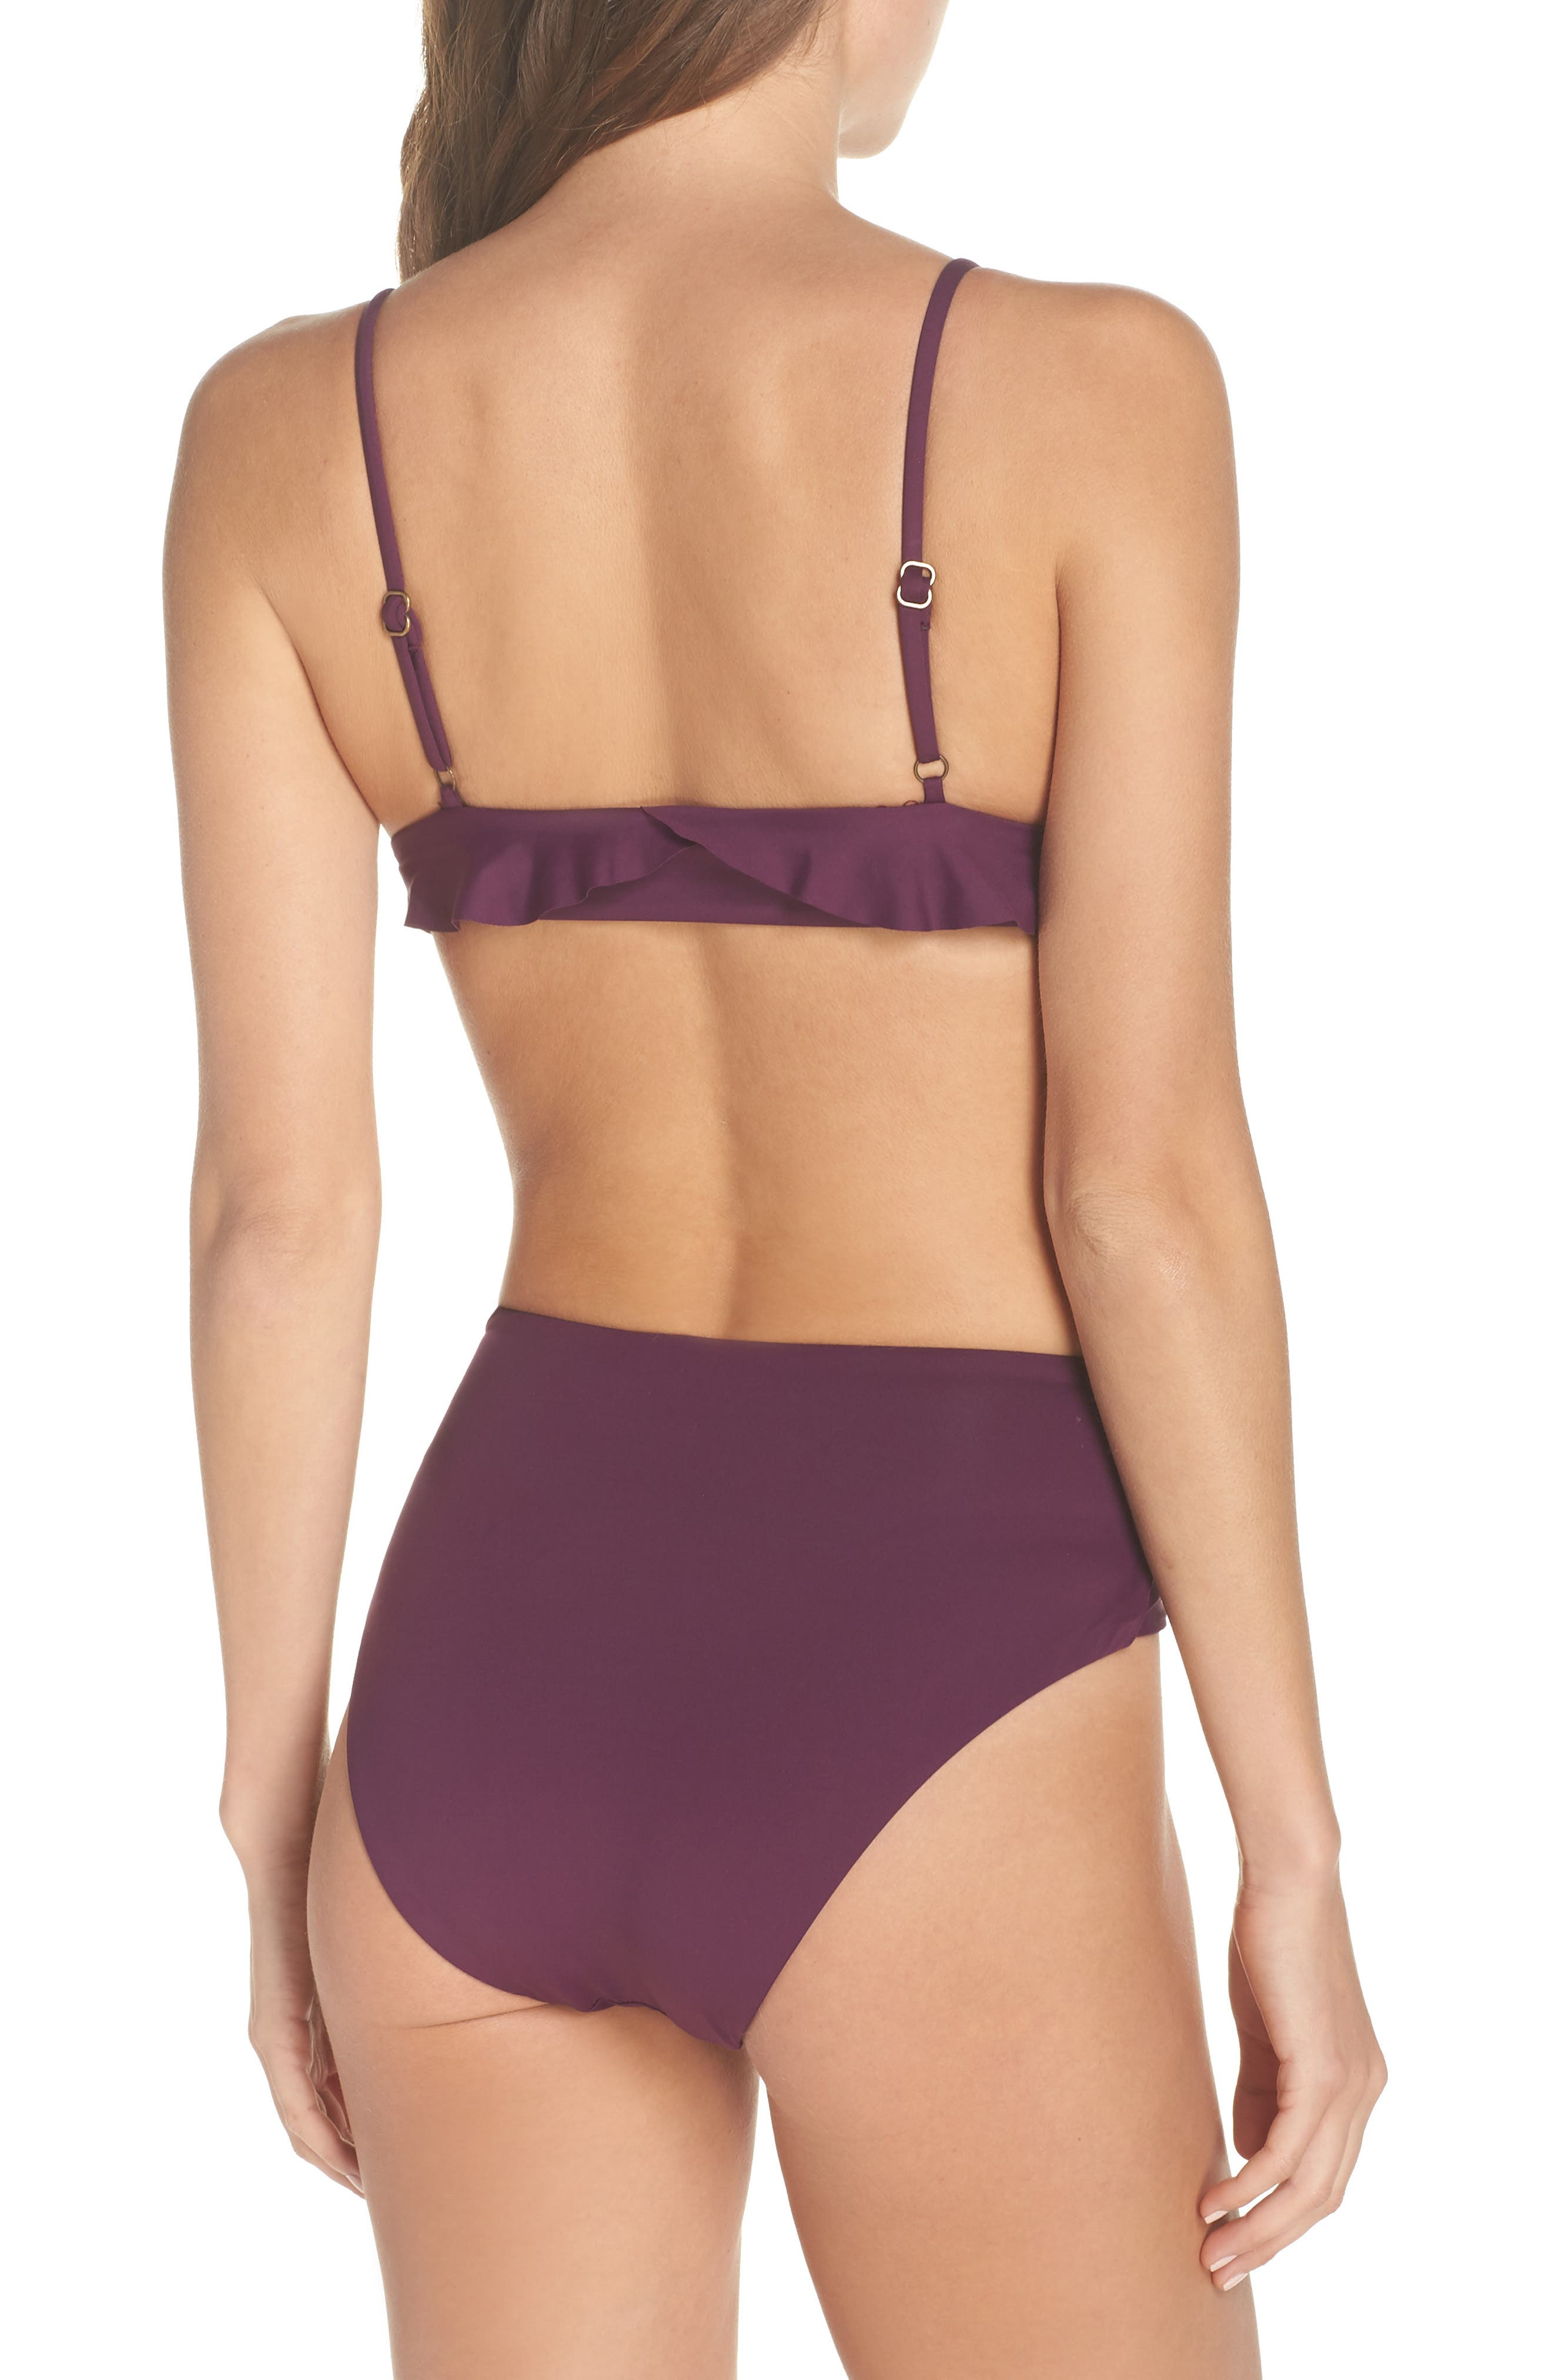 BECCA, Color Code Crossover High Waist Bikini Bottoms, Alternate thumbnail 9, color, MERLOT